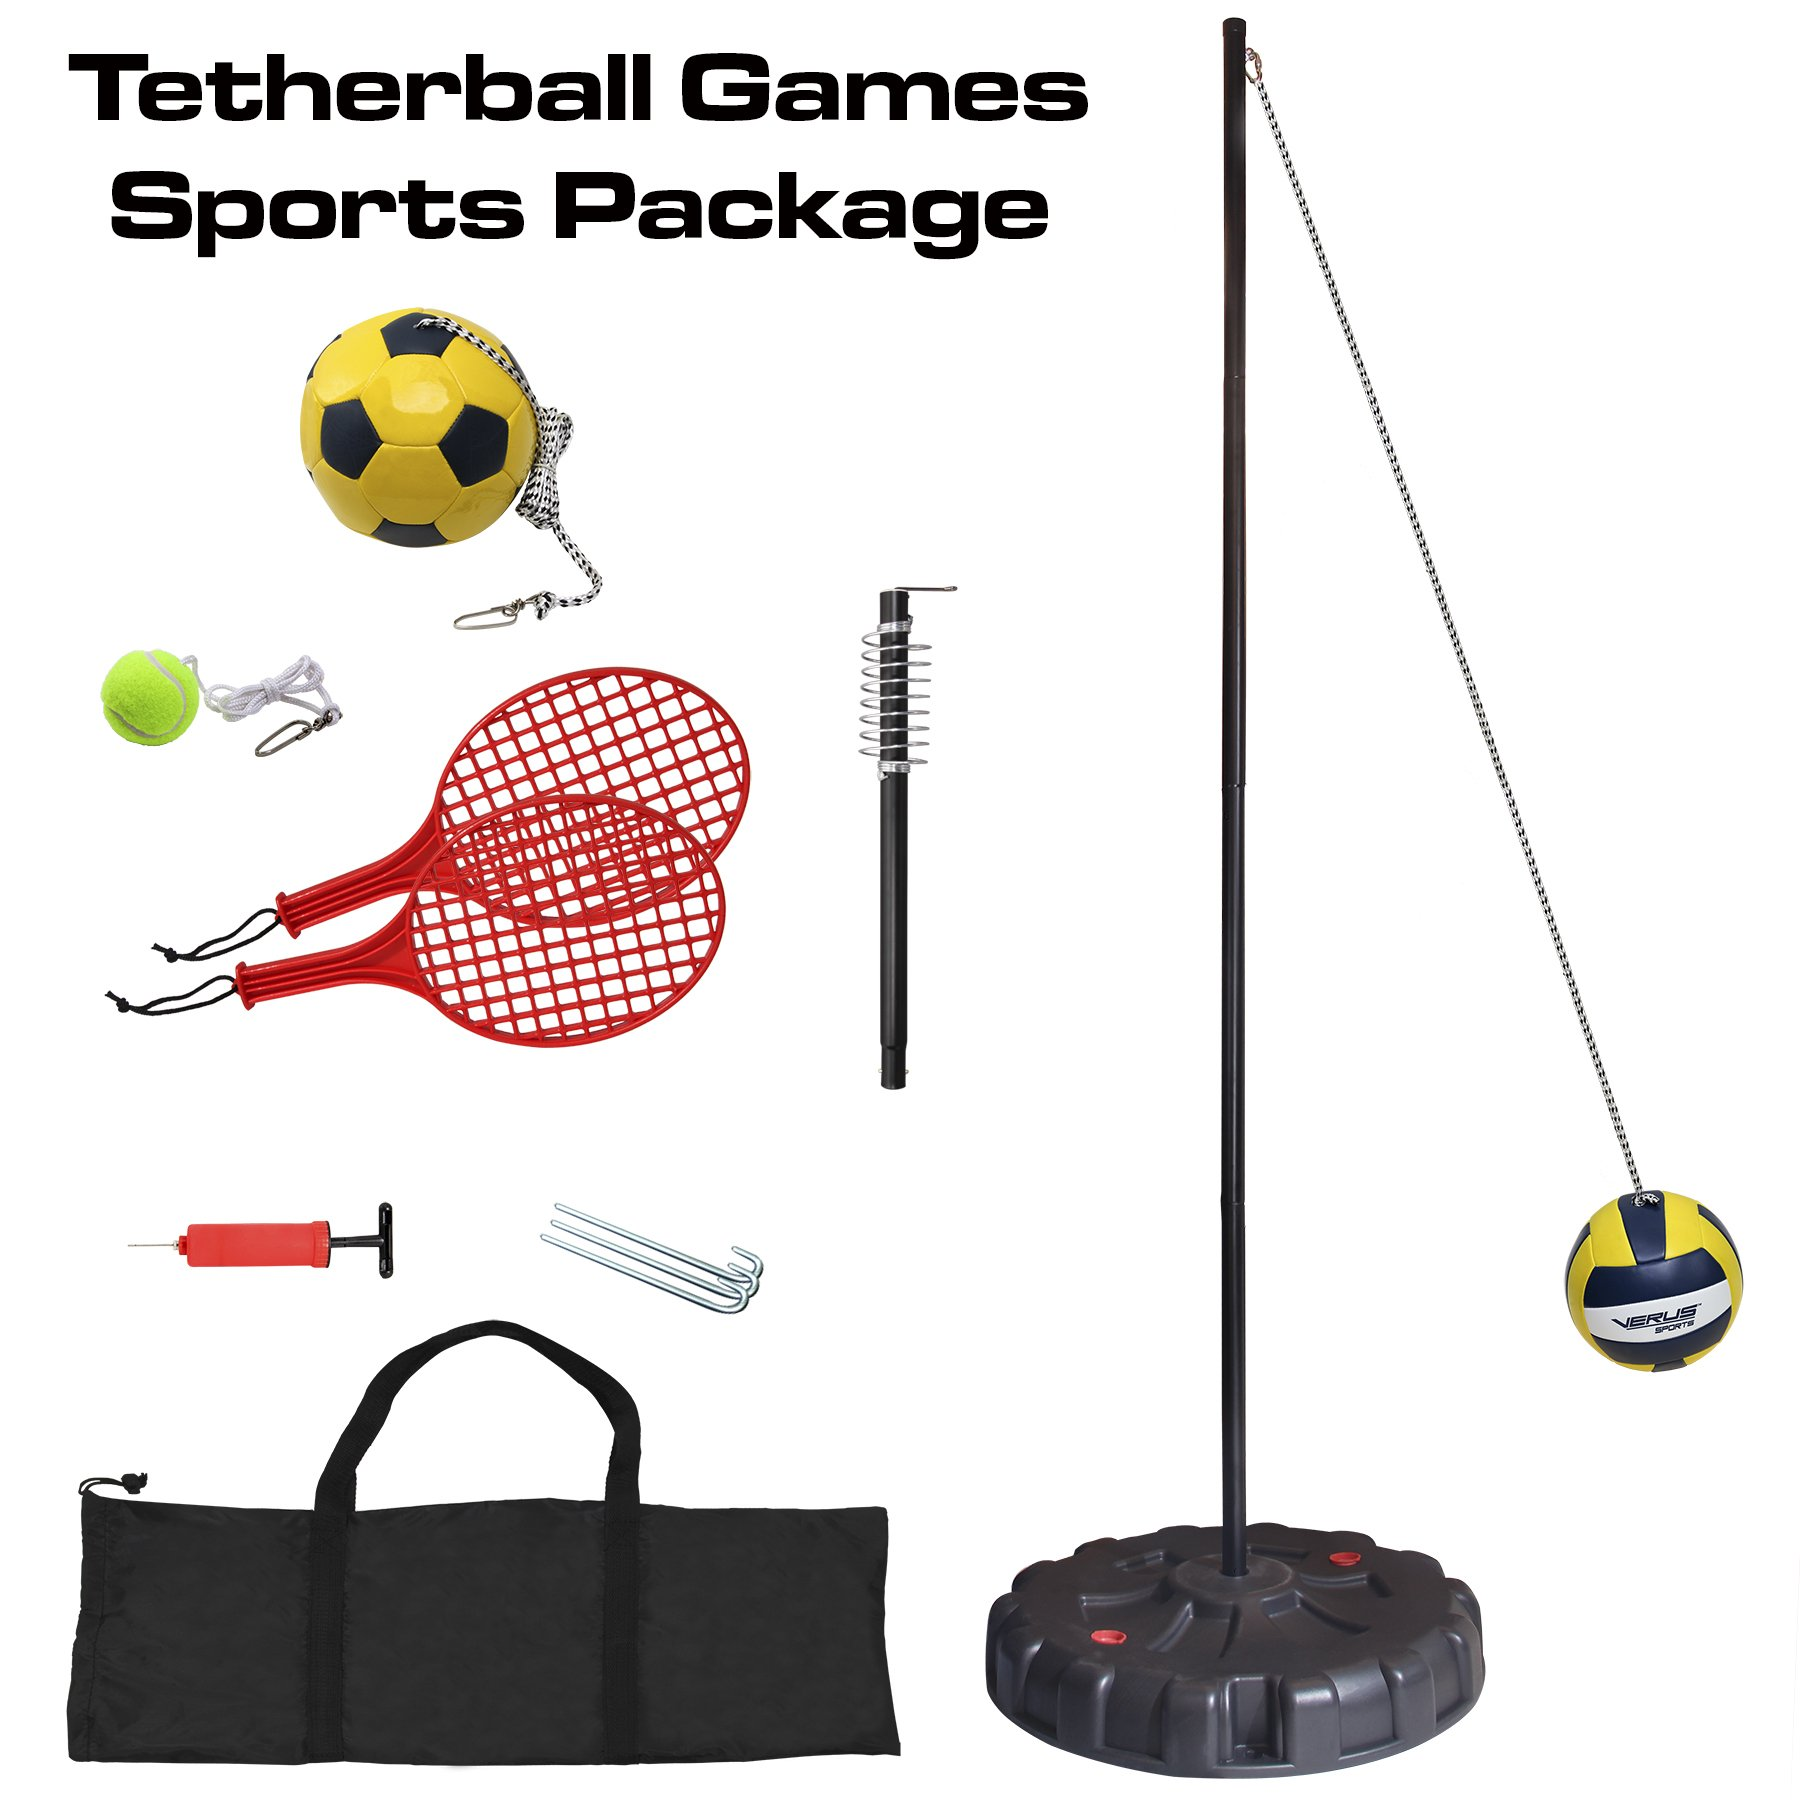 Verus Sports Portable 3-in-1 Tetherball Set